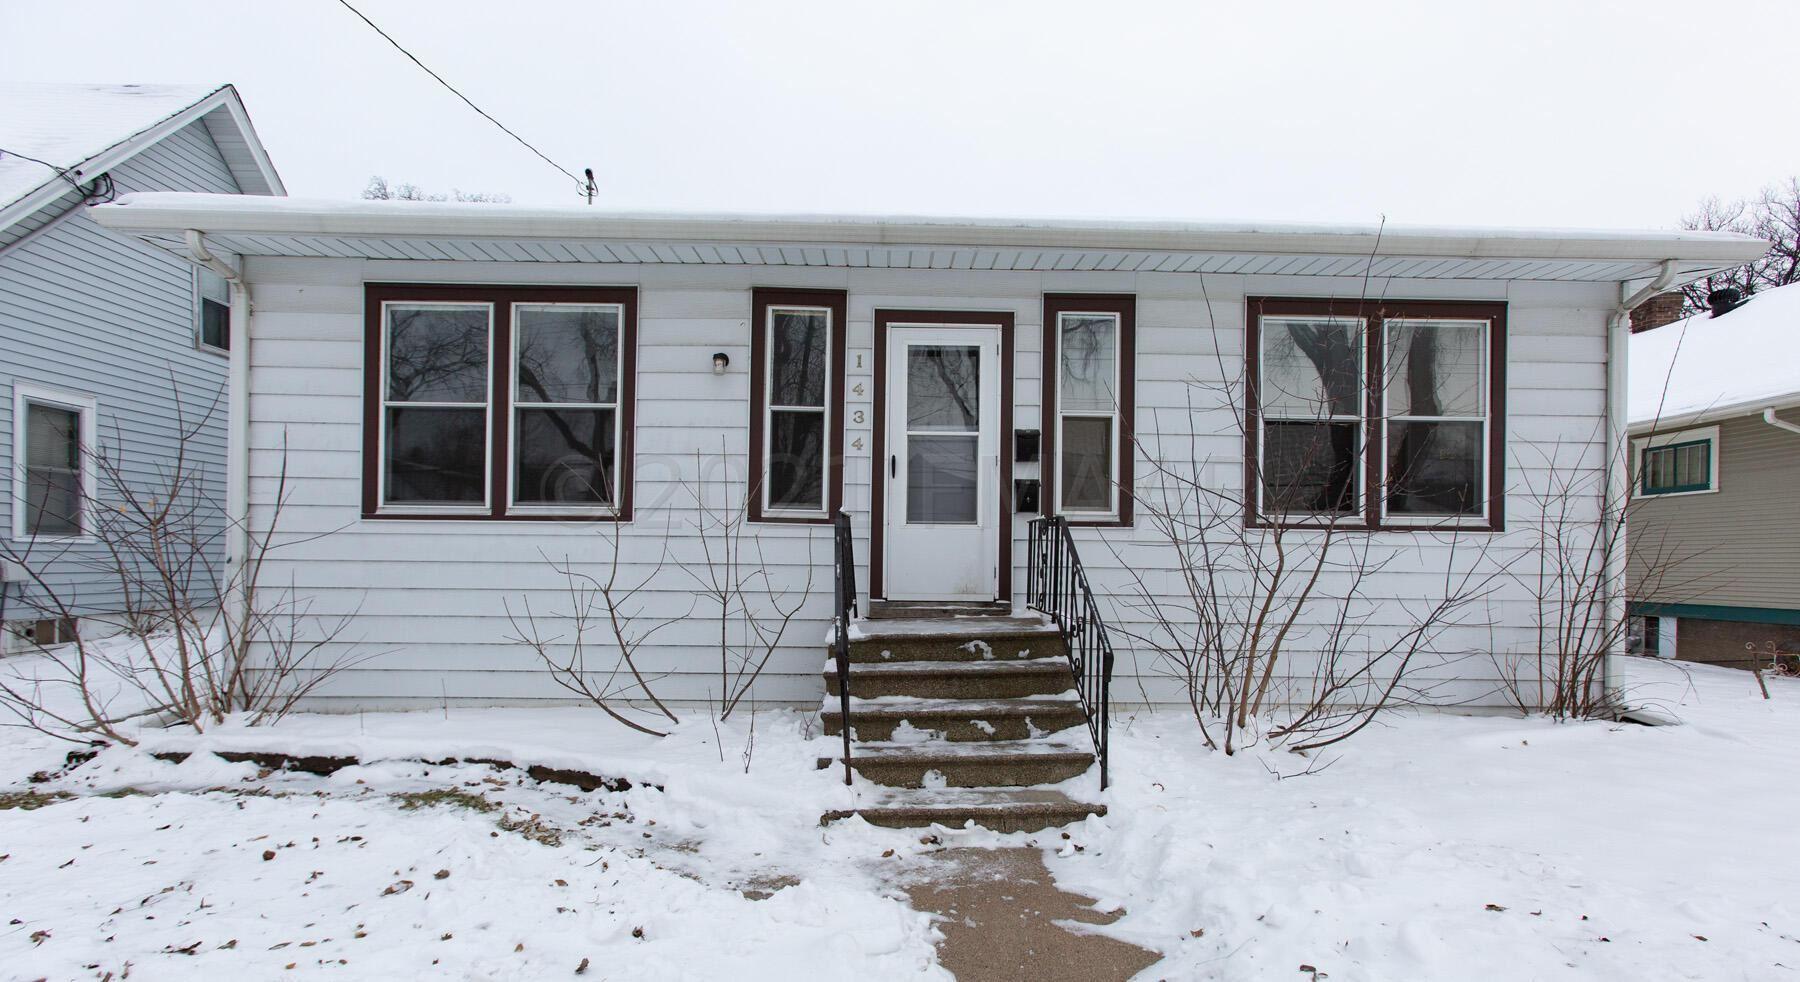 1434 3RD Avenue N, Fargo, ND 58102 - #: 21-4033